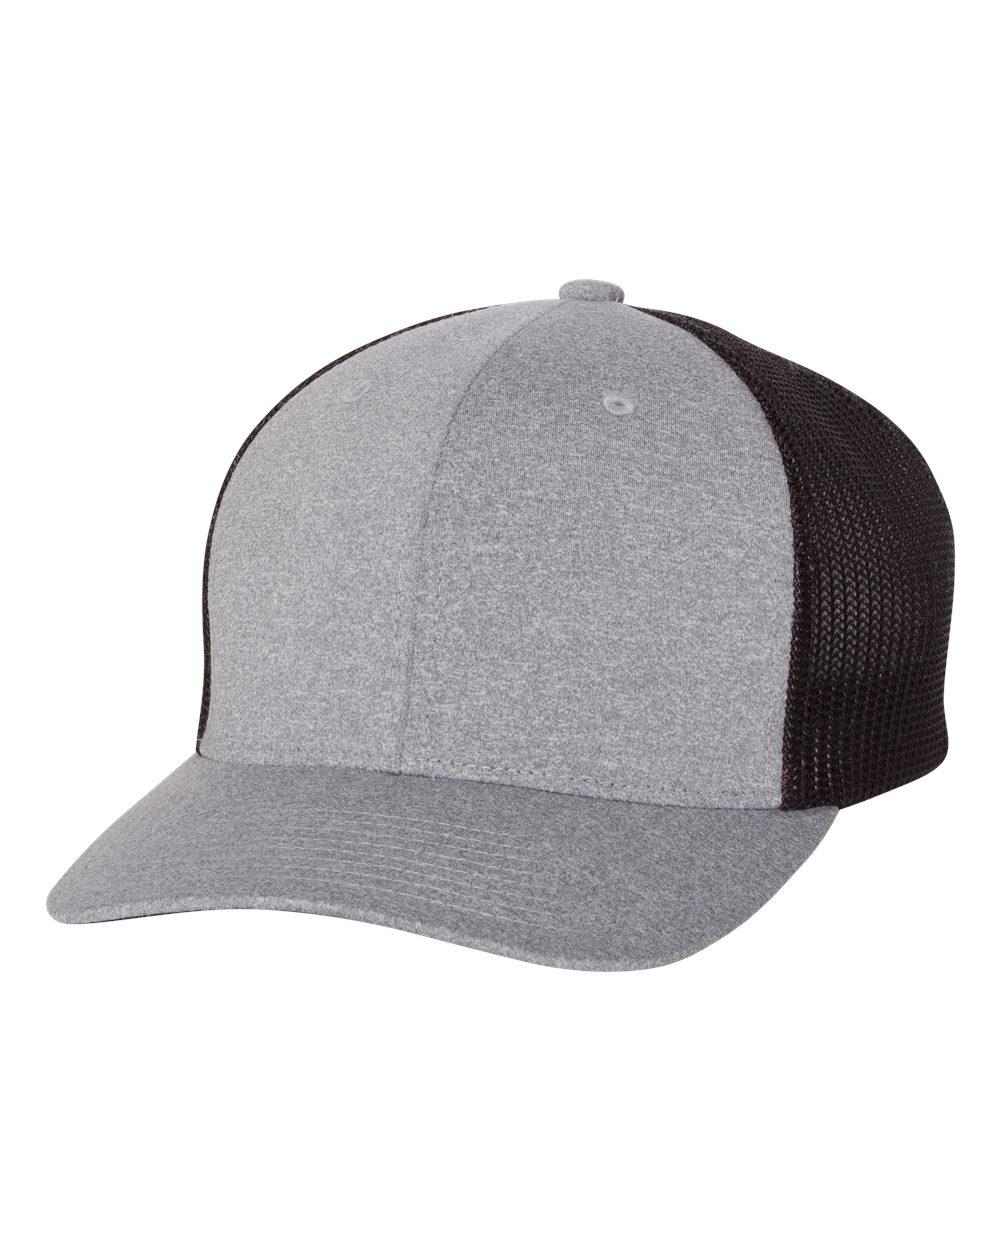 Flexfit 6311 - Melange Trucker Mesh Cap